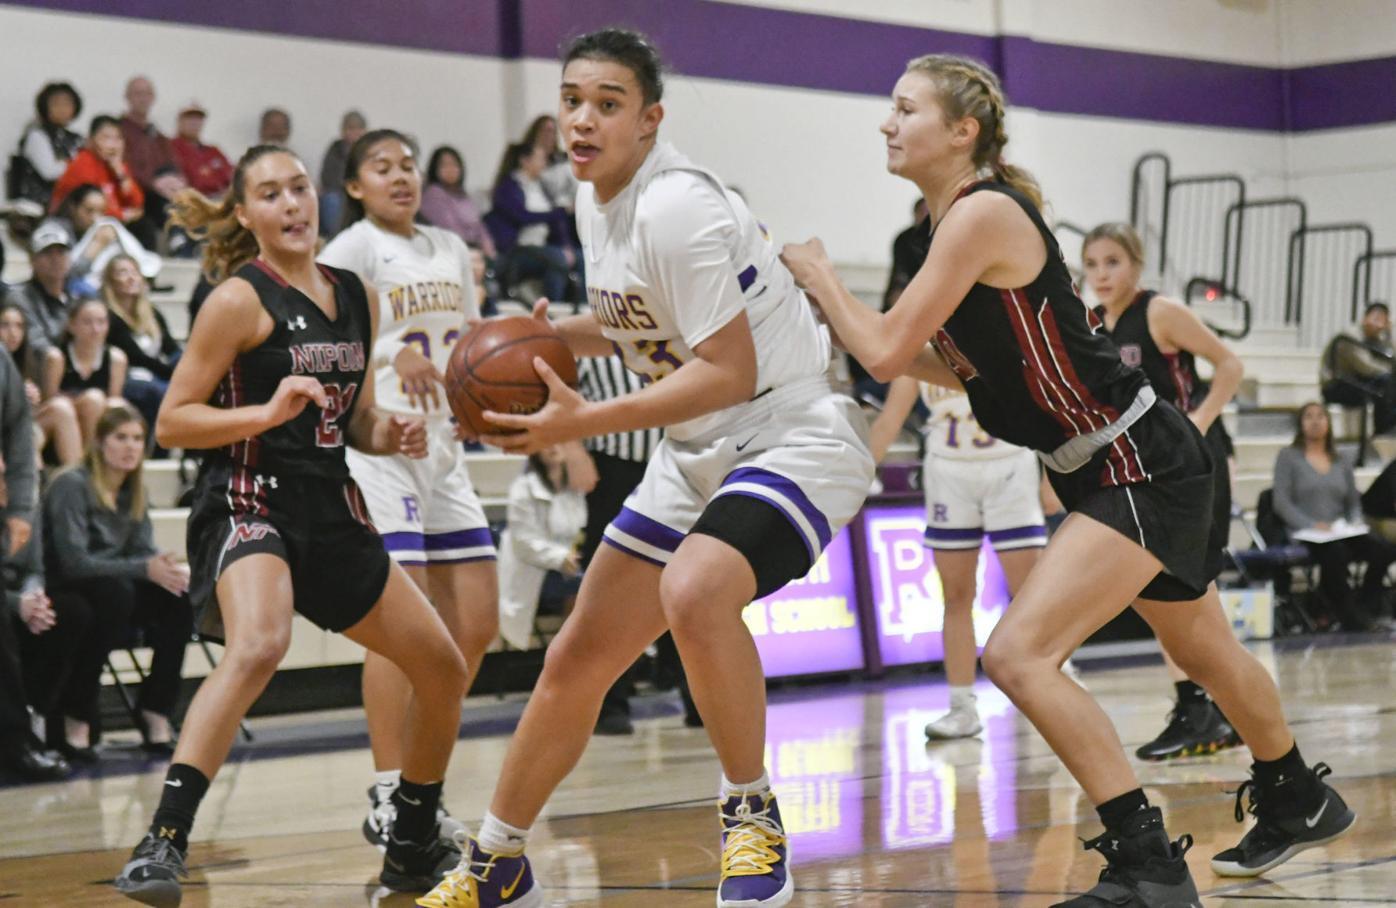 Girls basketball All-League: Malia Cabigon named Mountain League MVP, Giselle Calderon takes Ocean League honor